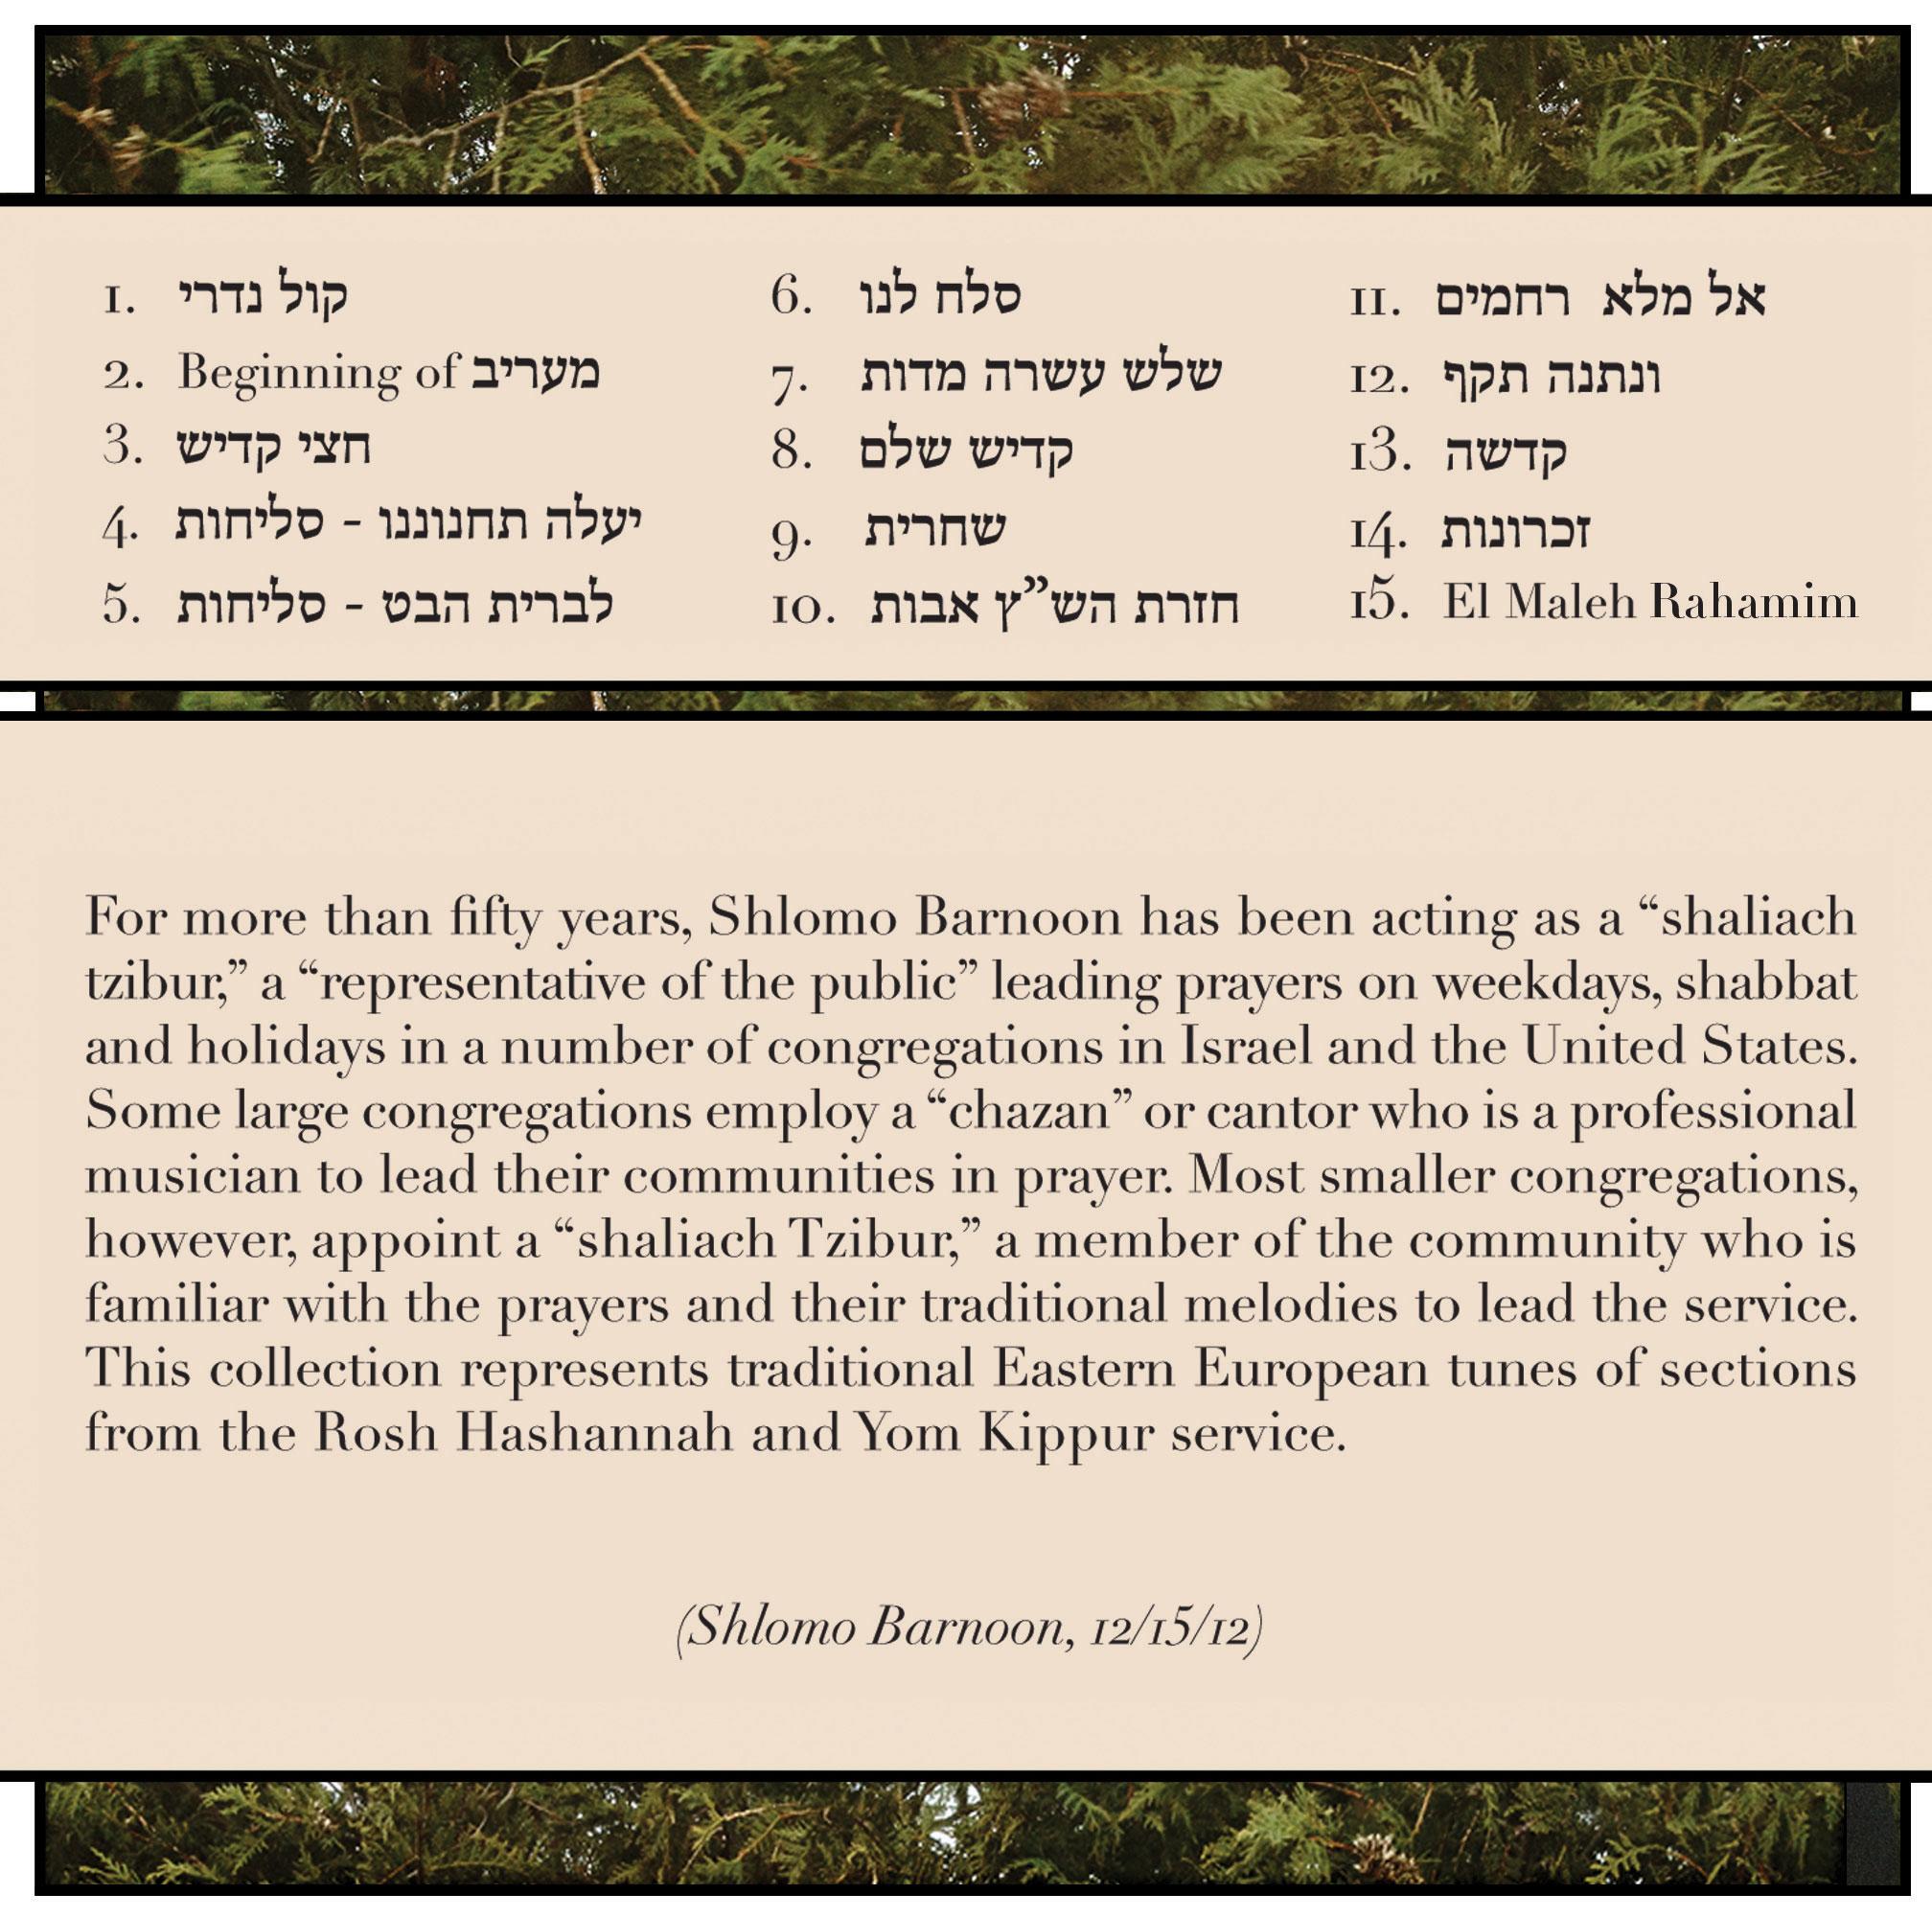 Abraham Ravett - Audio CDs - Jewish Liturgical Music: Shlomo